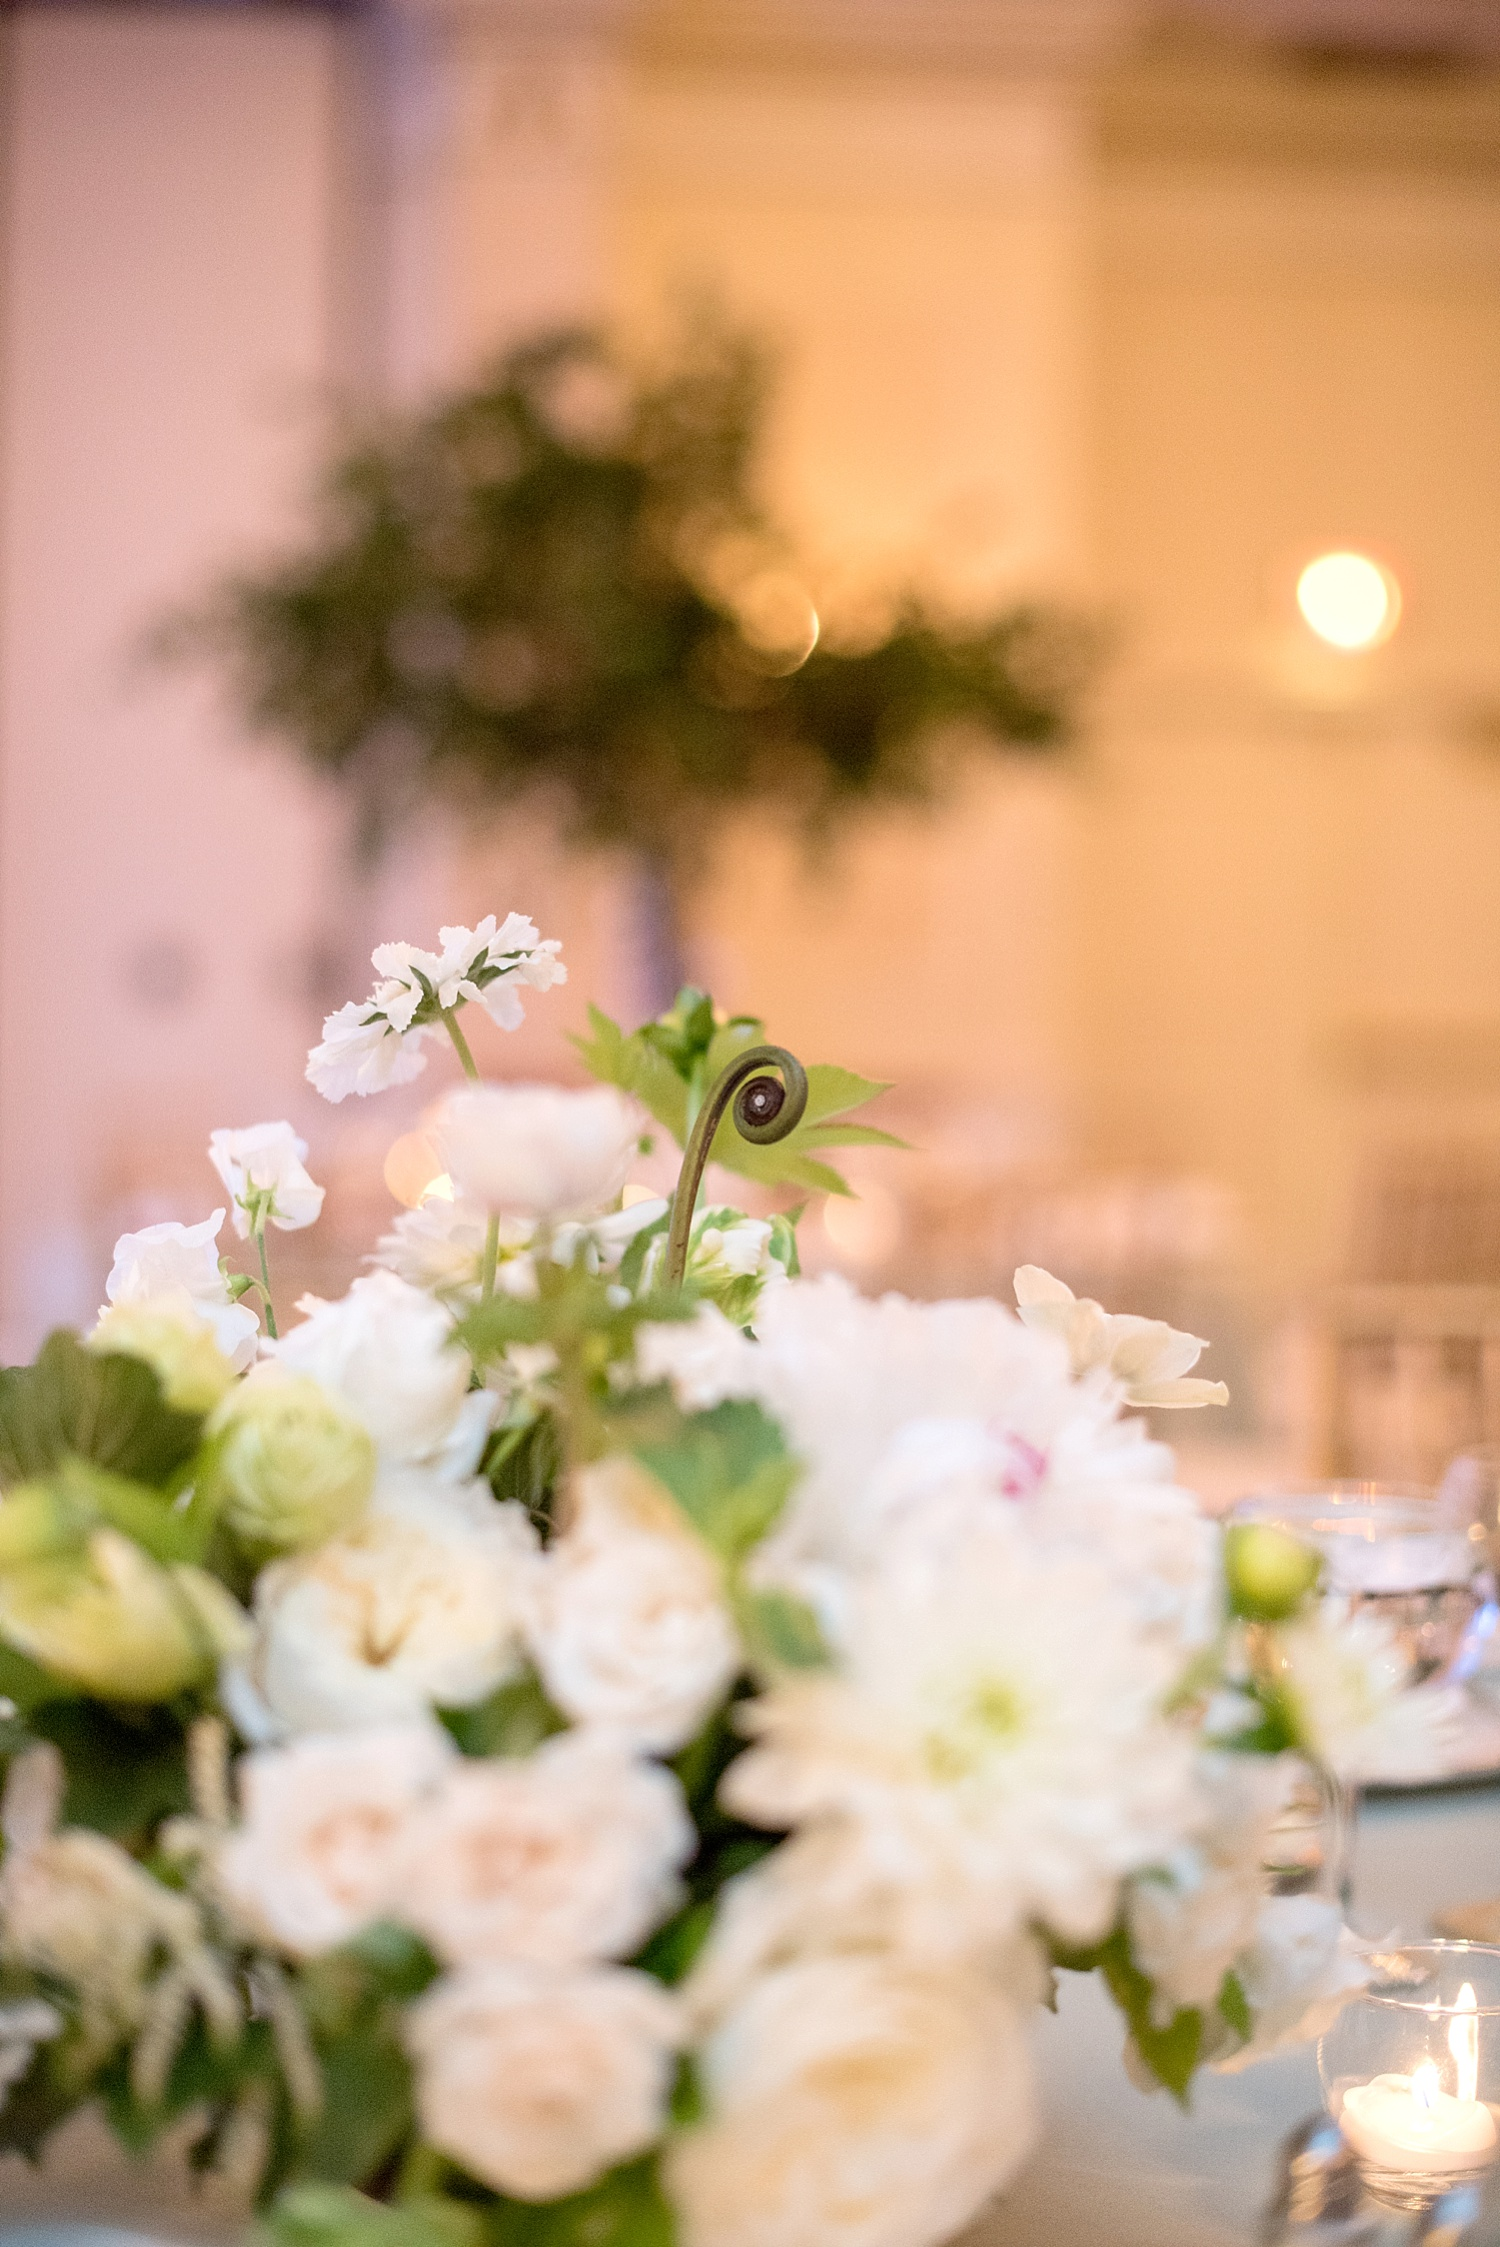 mikkelpaige-full_aperture_floral-pearl_river_hilton_wedding_0033.jpg